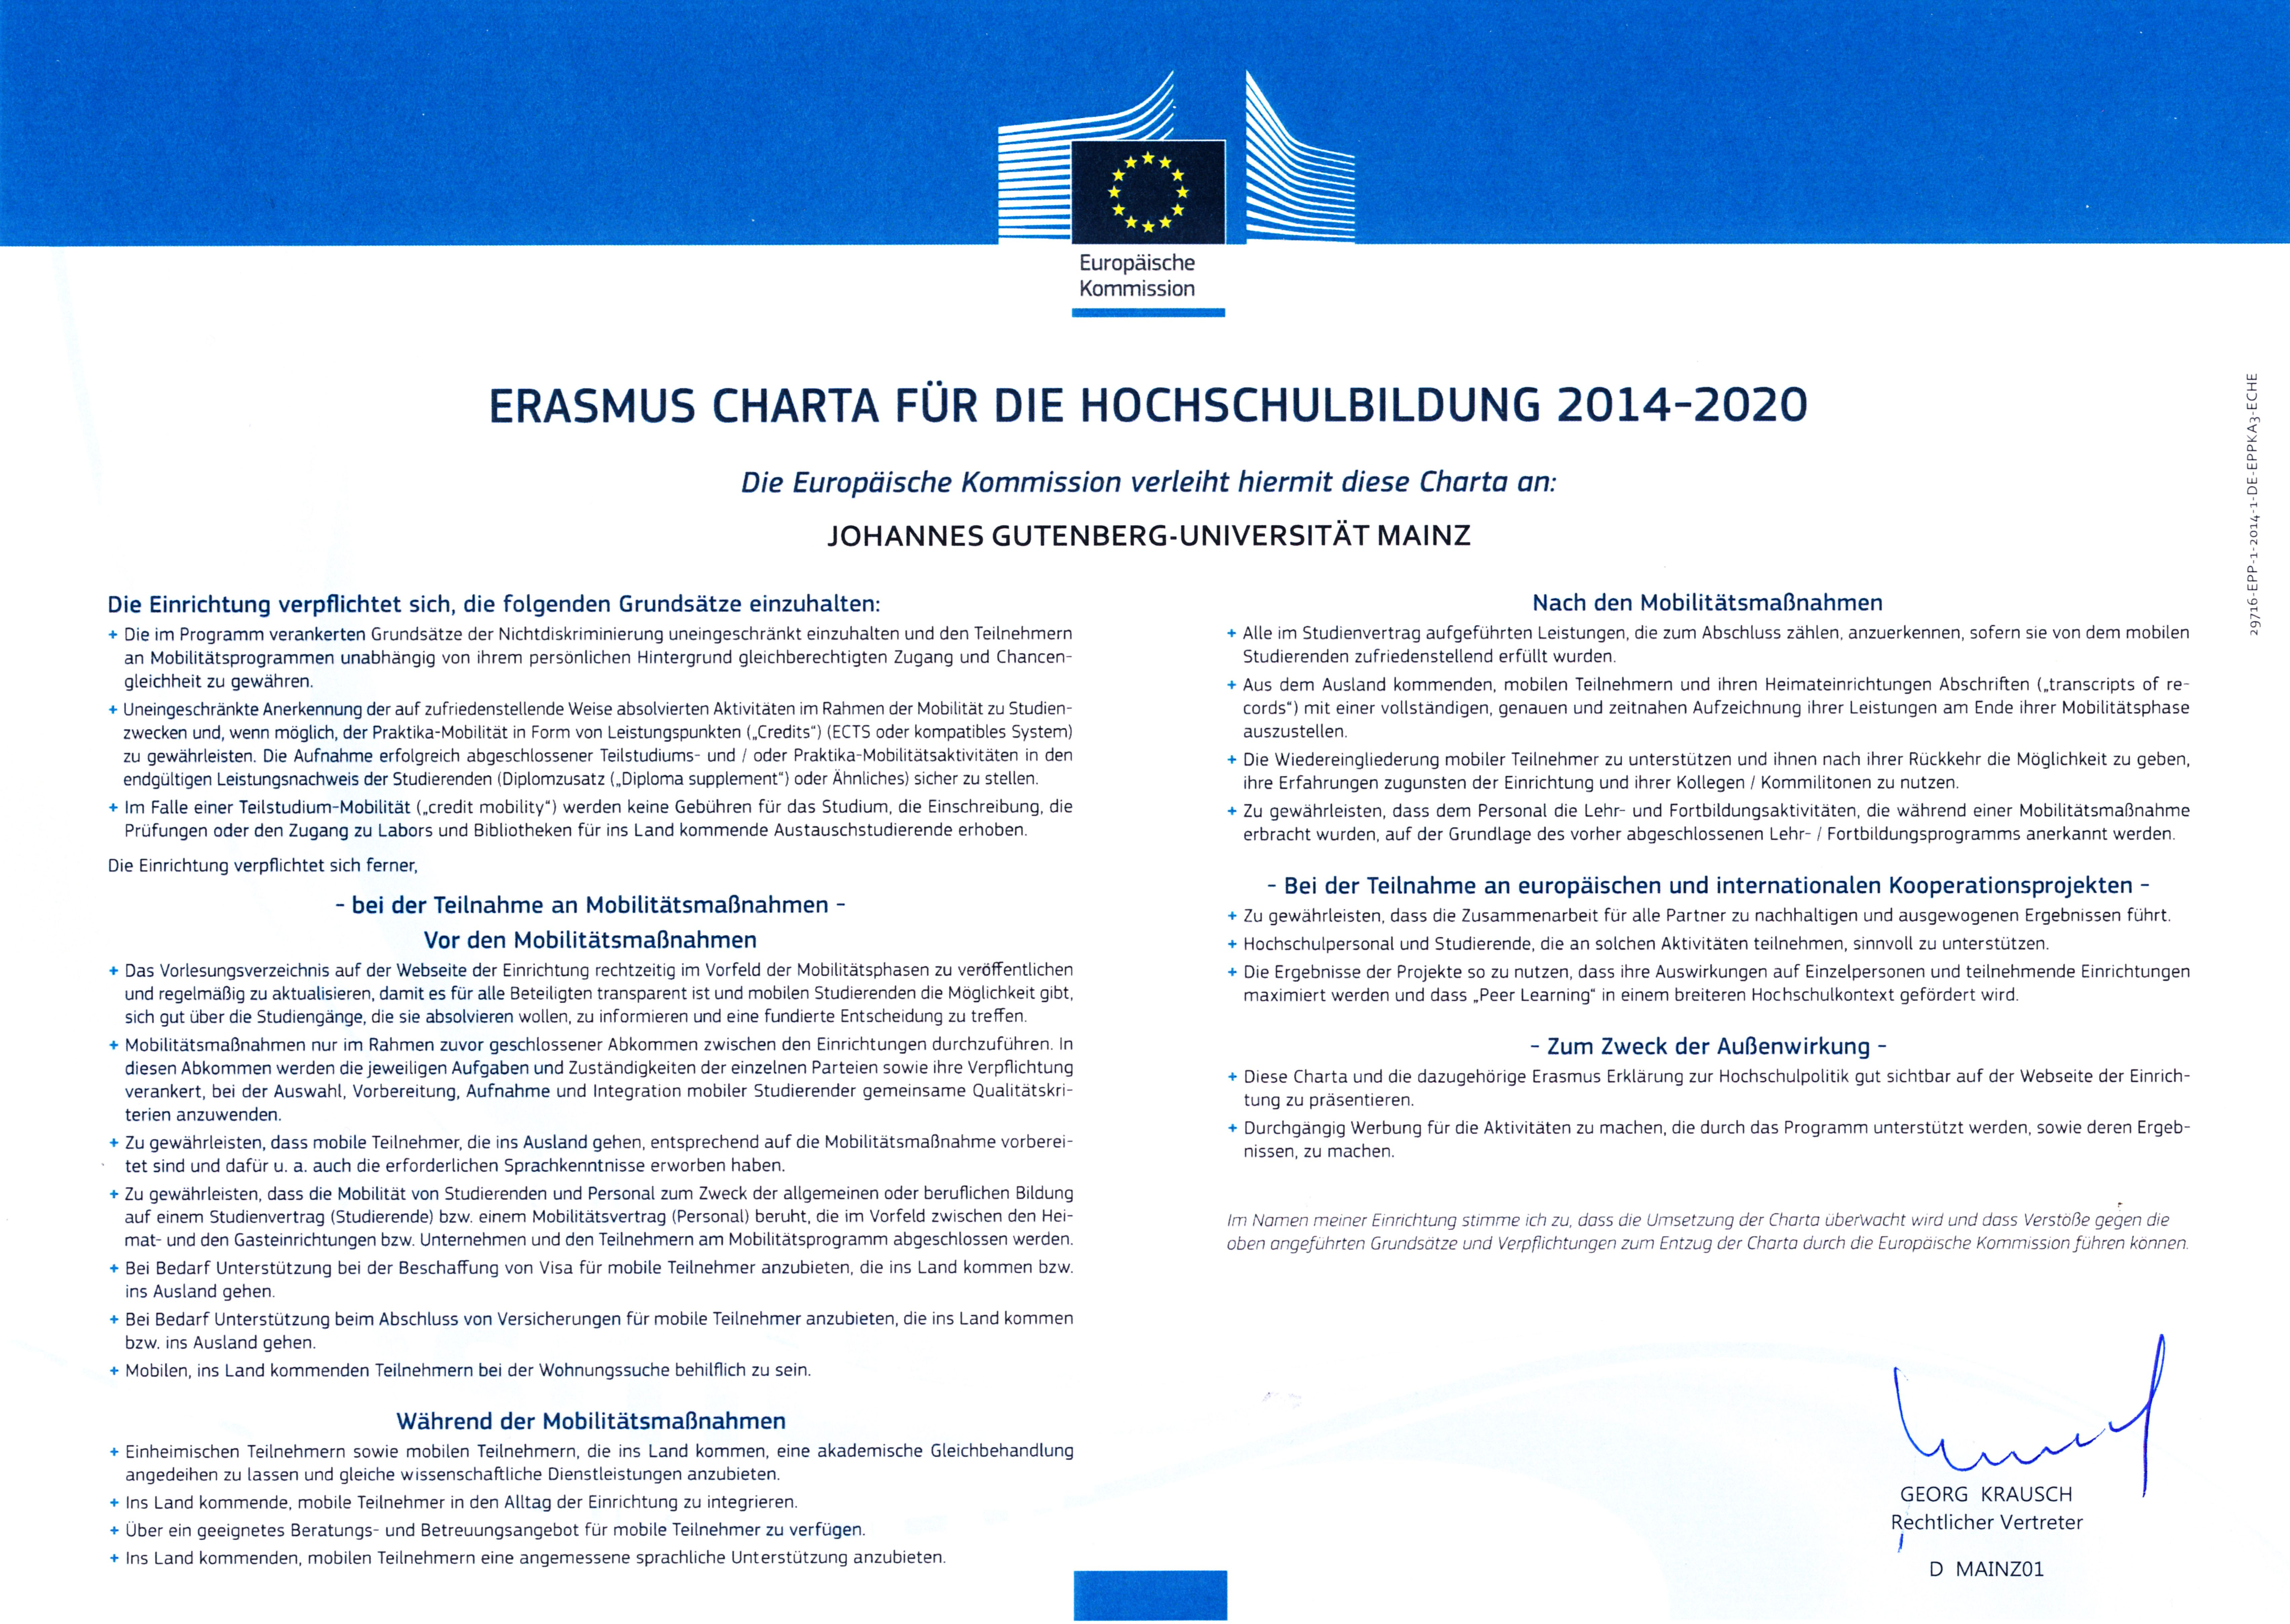 erasmus charter for higher education eche 2014 2020 - Uni Mainz Bewerbung